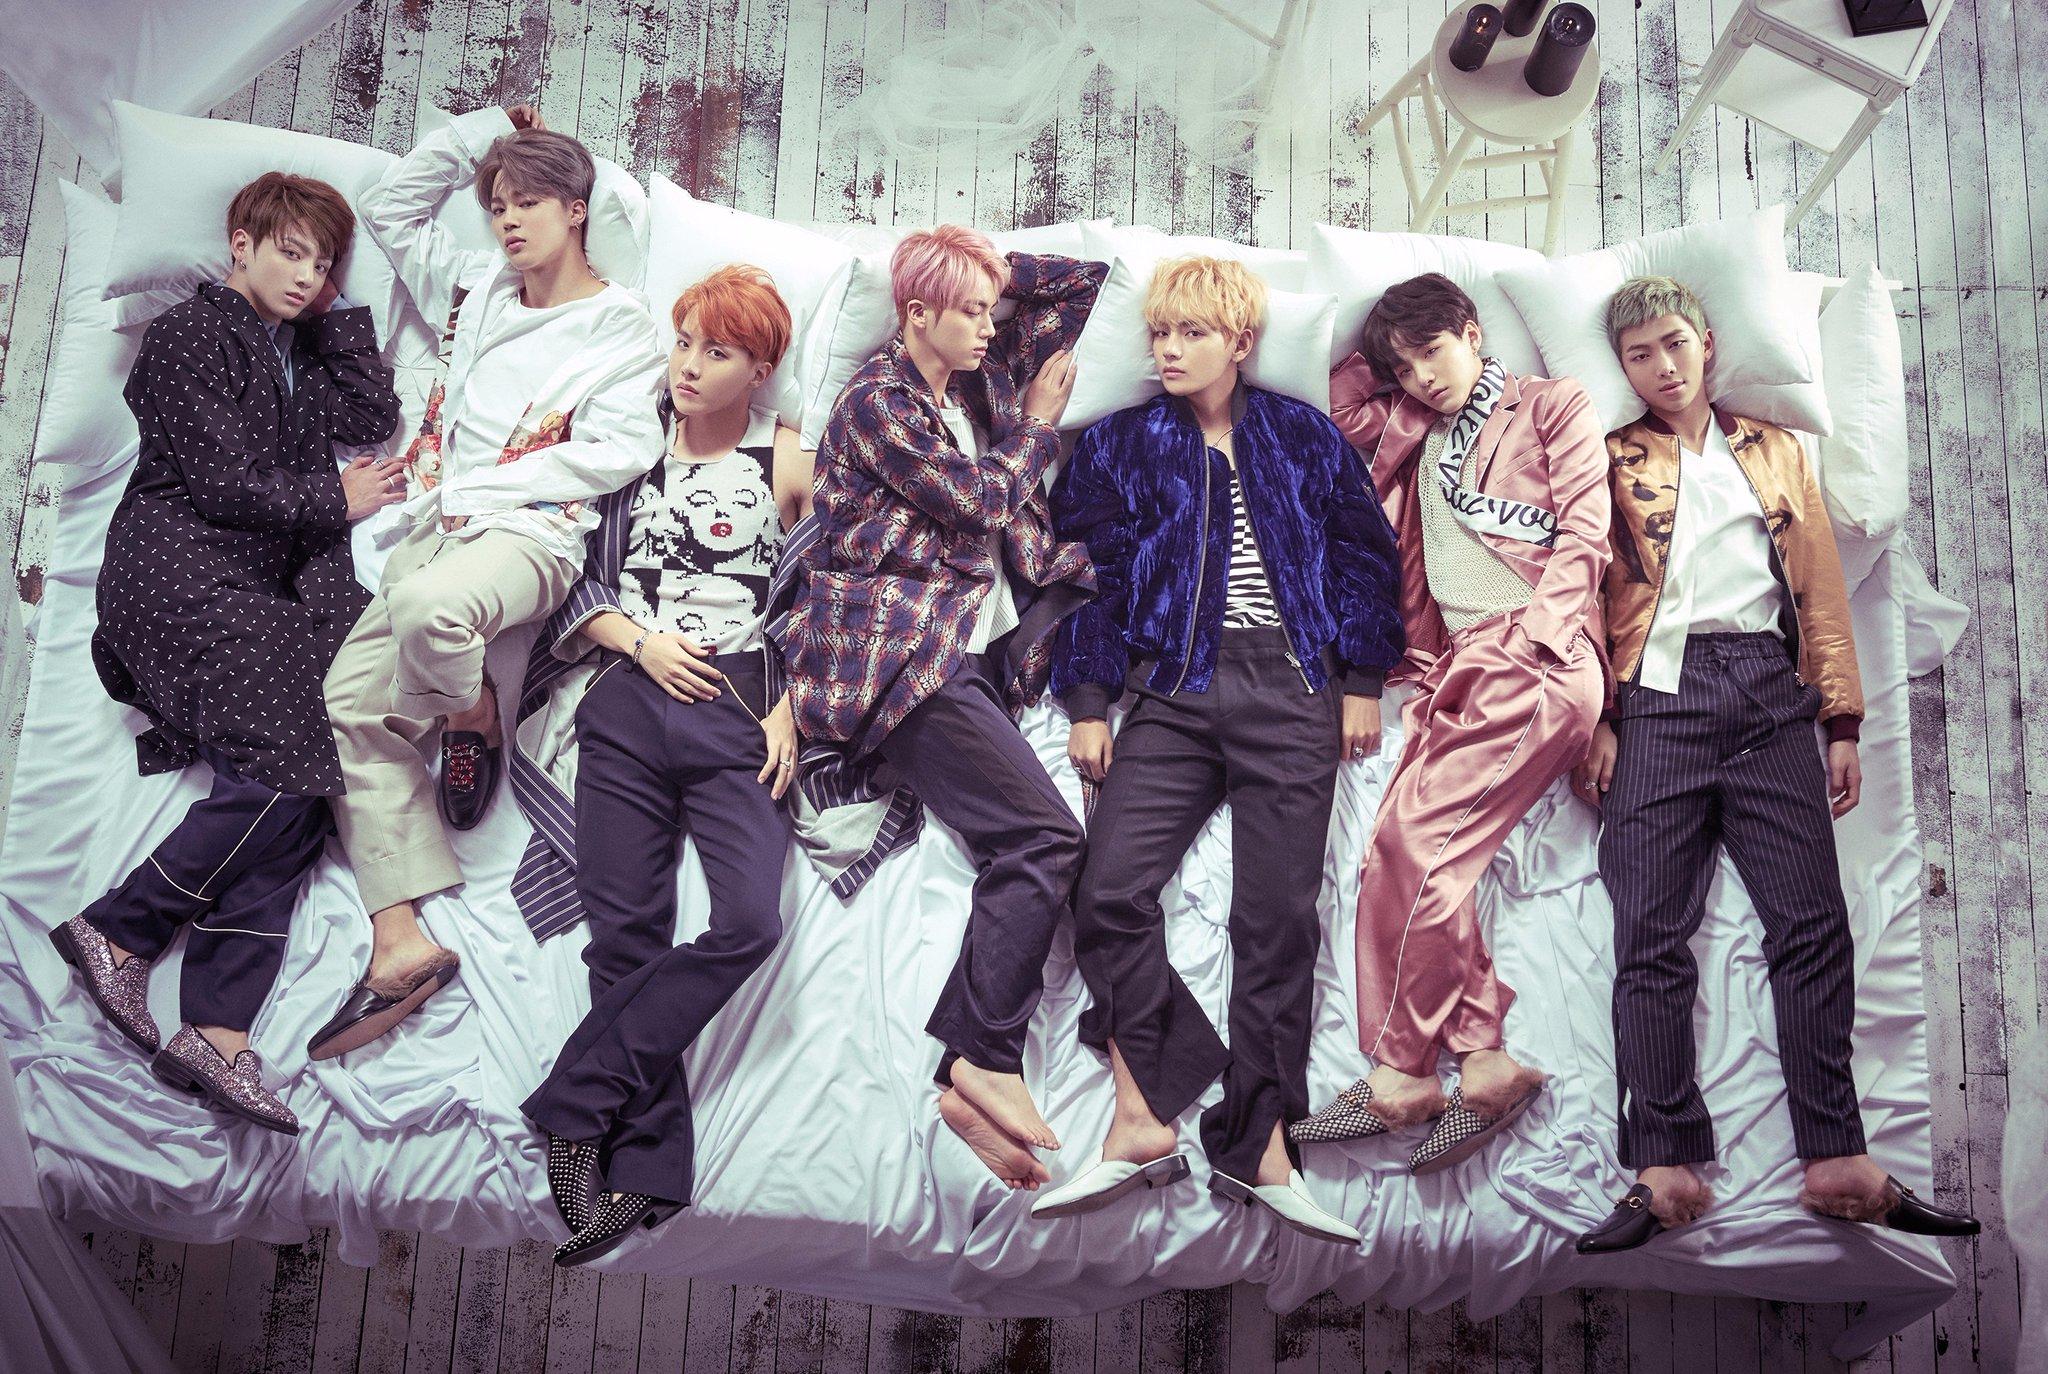 BTS Sells A Whopping 500,000 Copies Of WINGS In 1st Week Of Pre-Sale